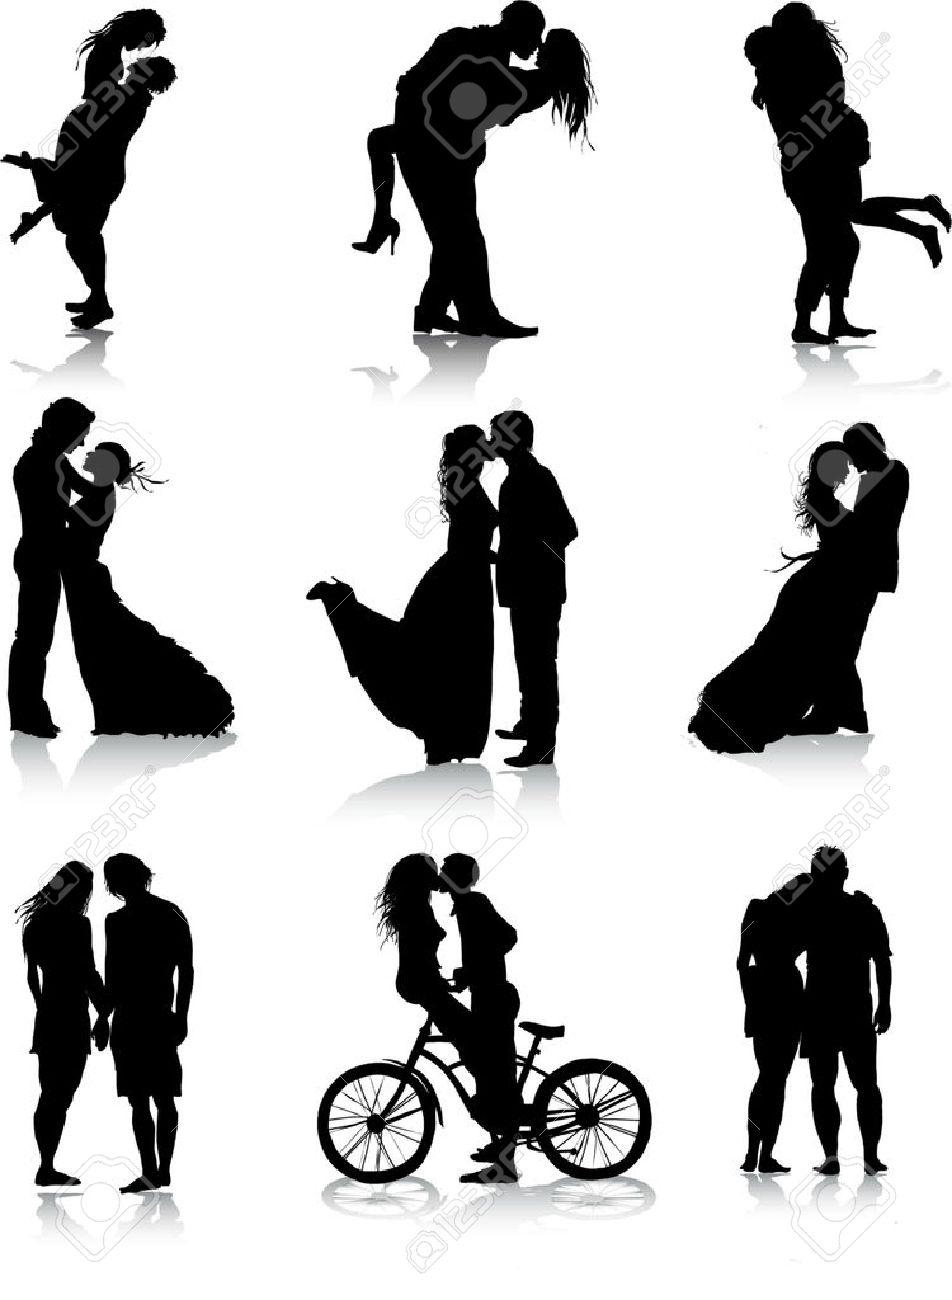 Romantic couples silhouettes - 32489328